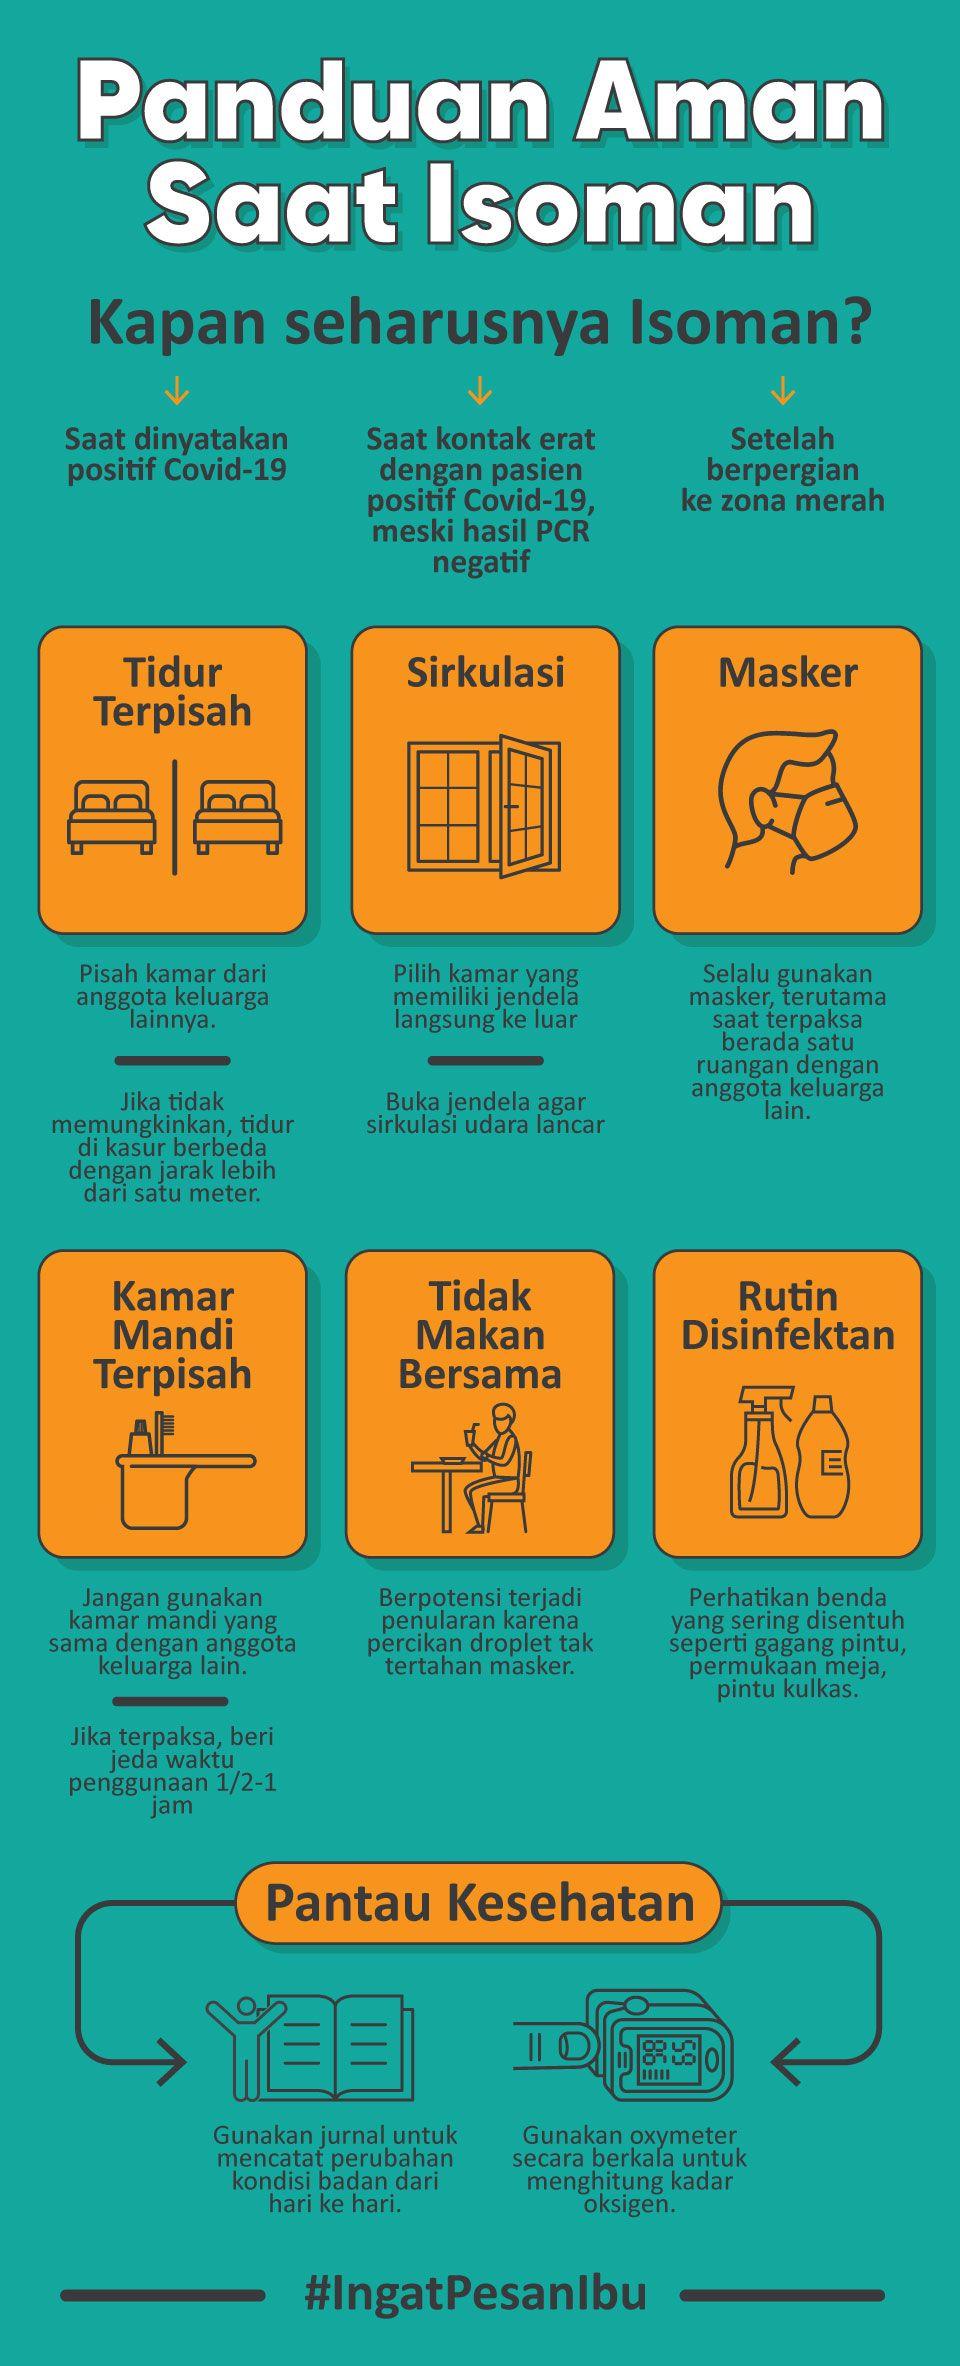 Infografis Panduan Aaman Saat Isoman